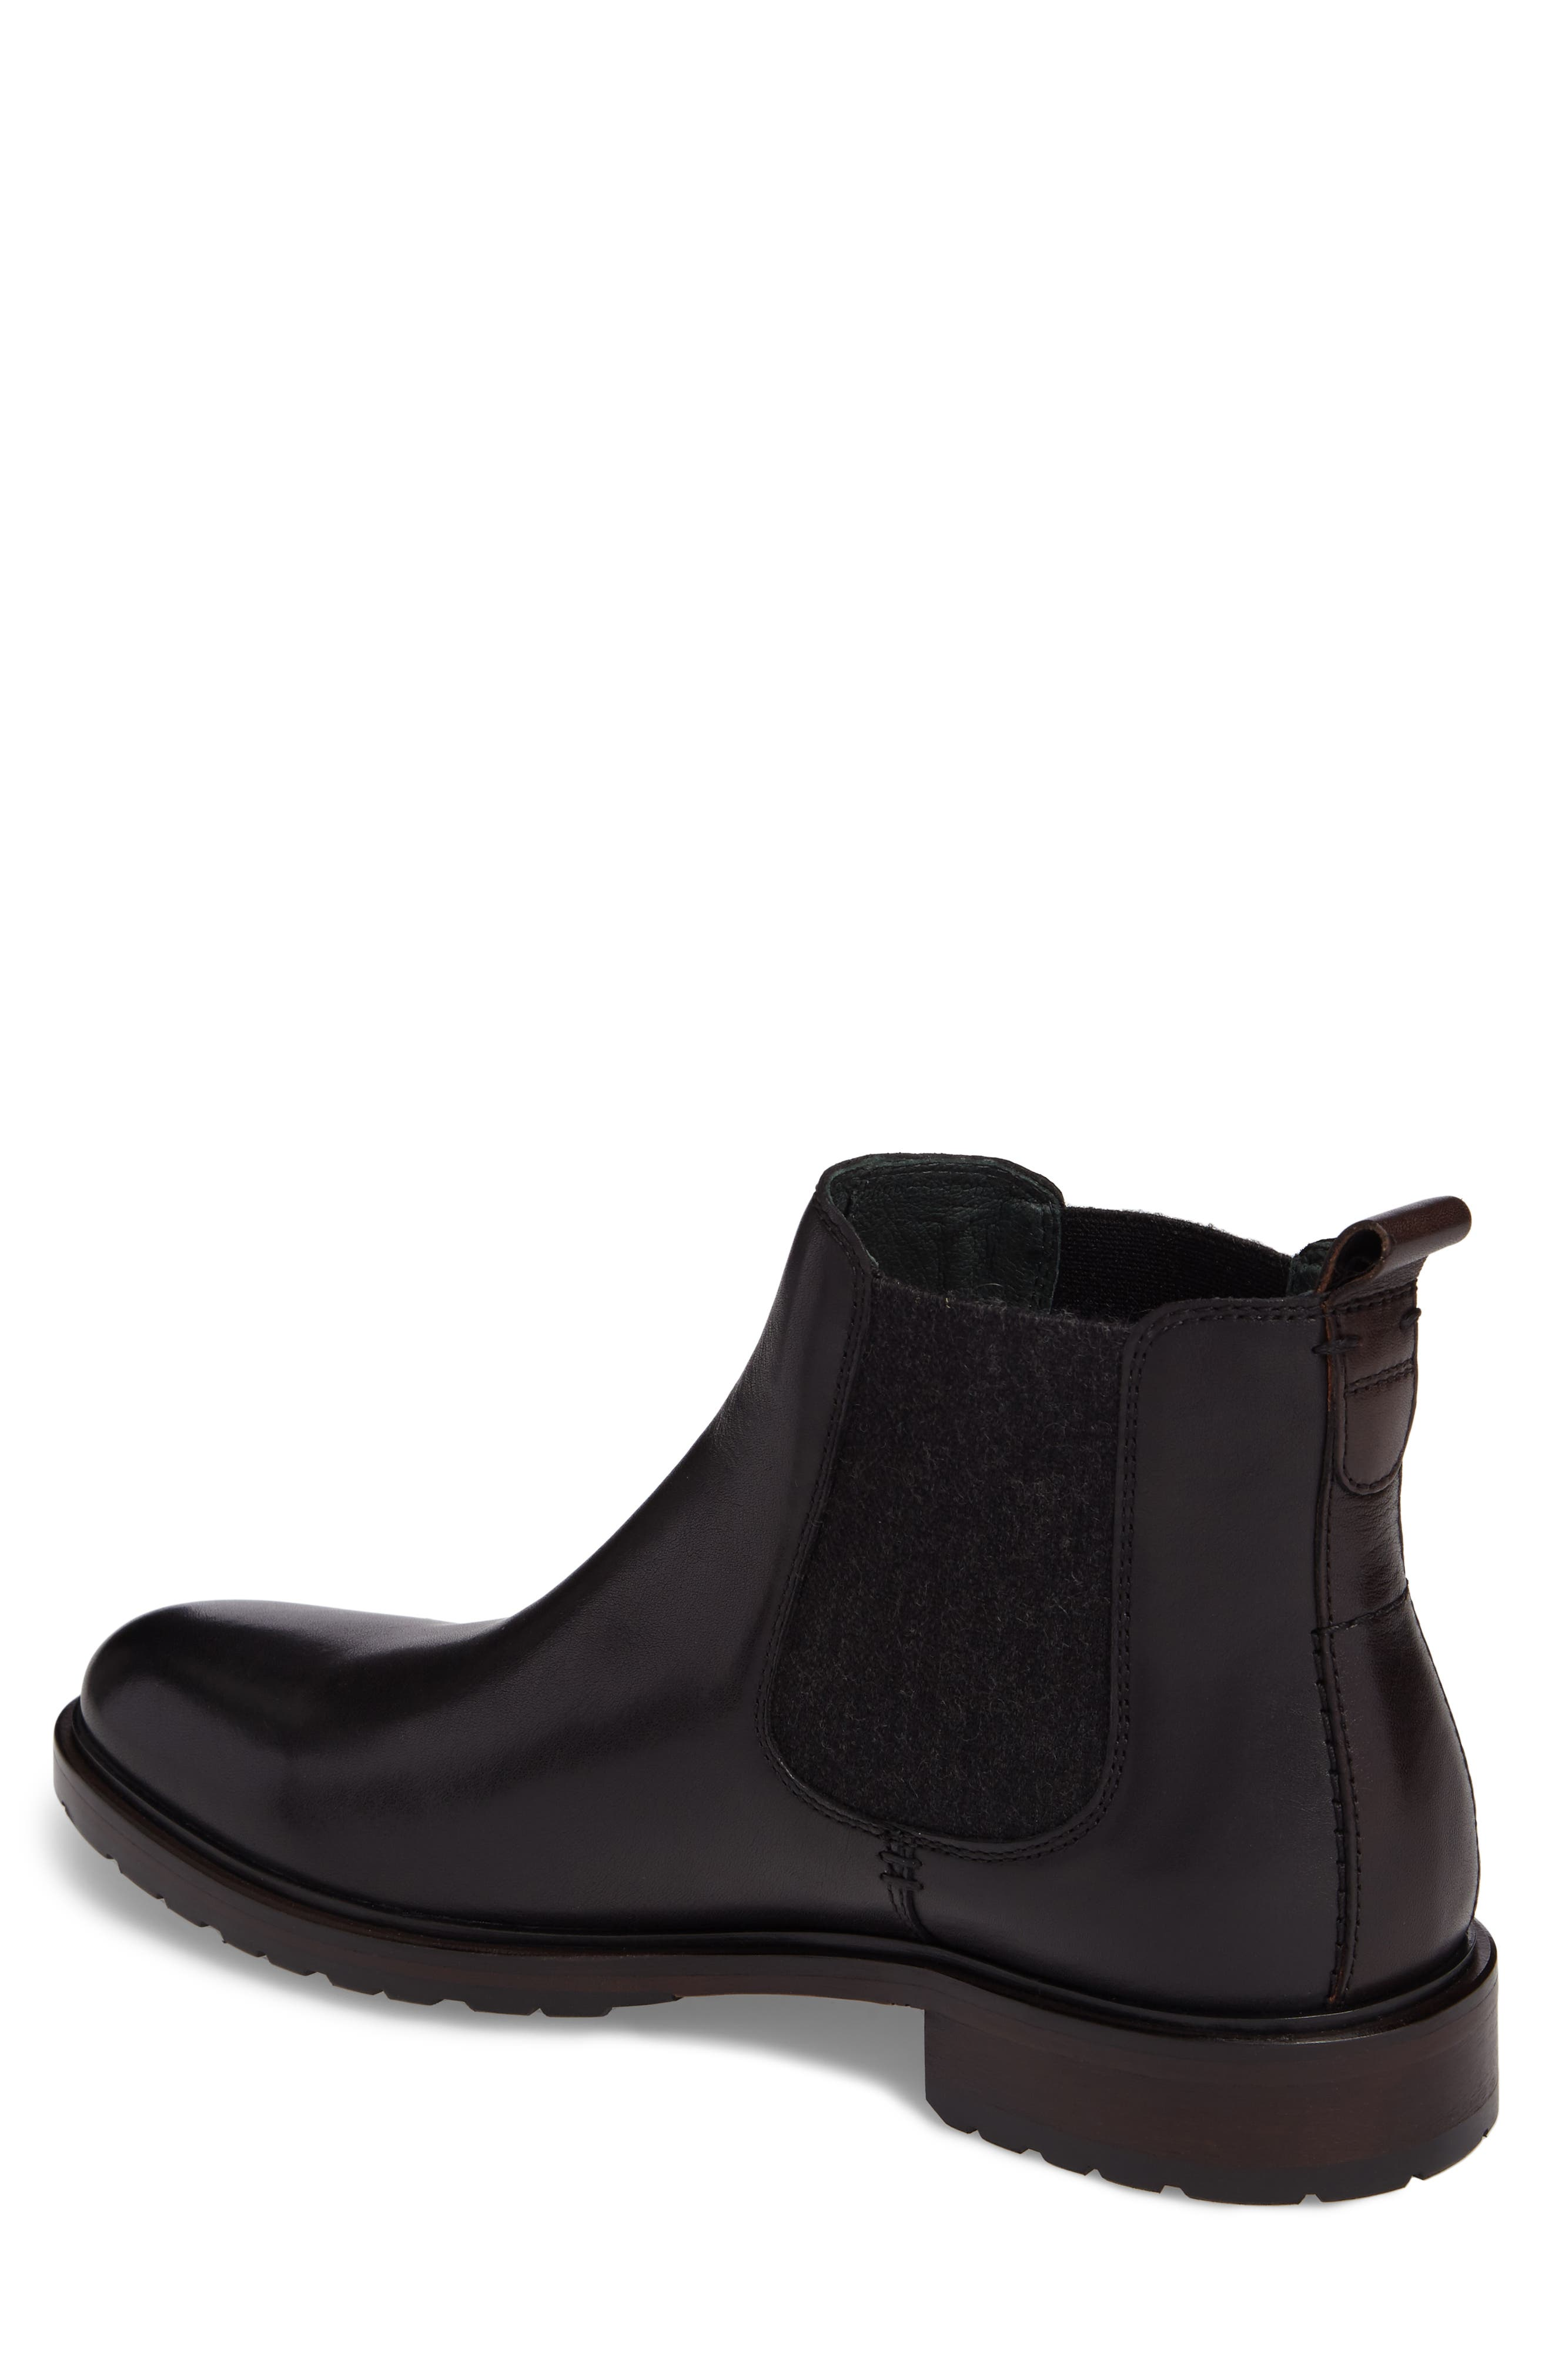 Myles Chelsea Boot,                             Alternate thumbnail 2, color,                             Black Leather